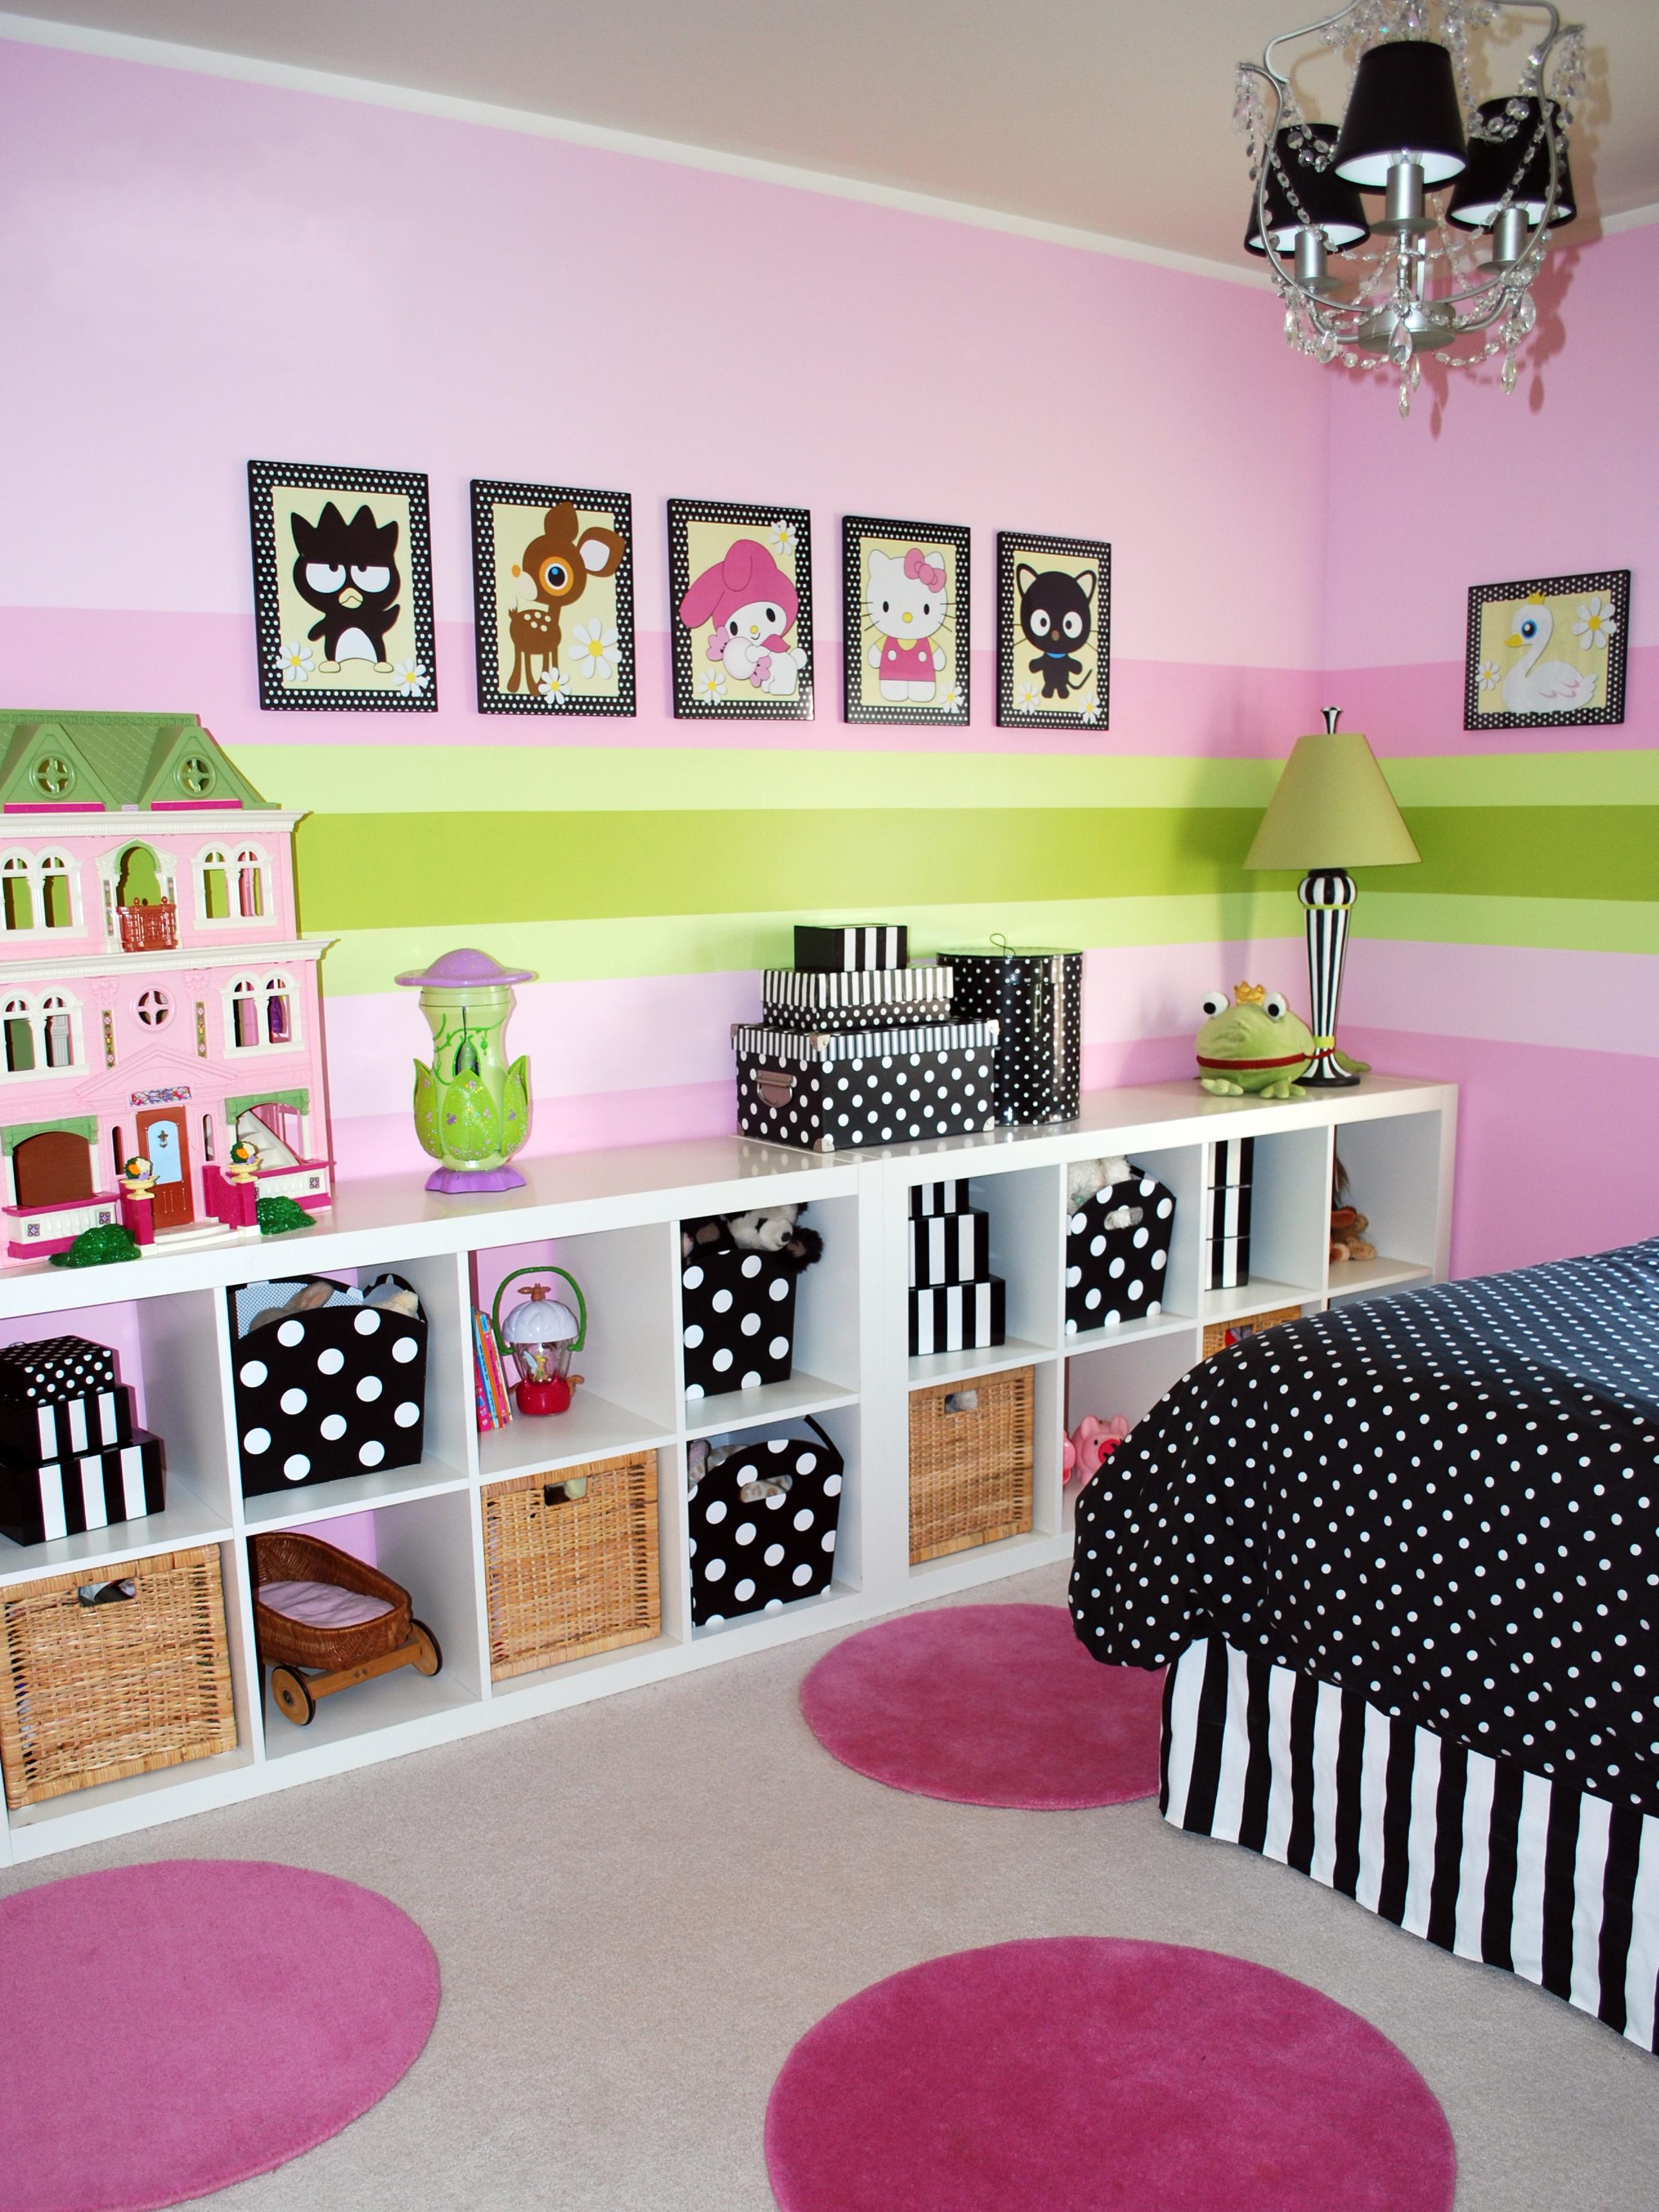 Girls Bedroom Storage Ideas 912350 Hd Wallpaper